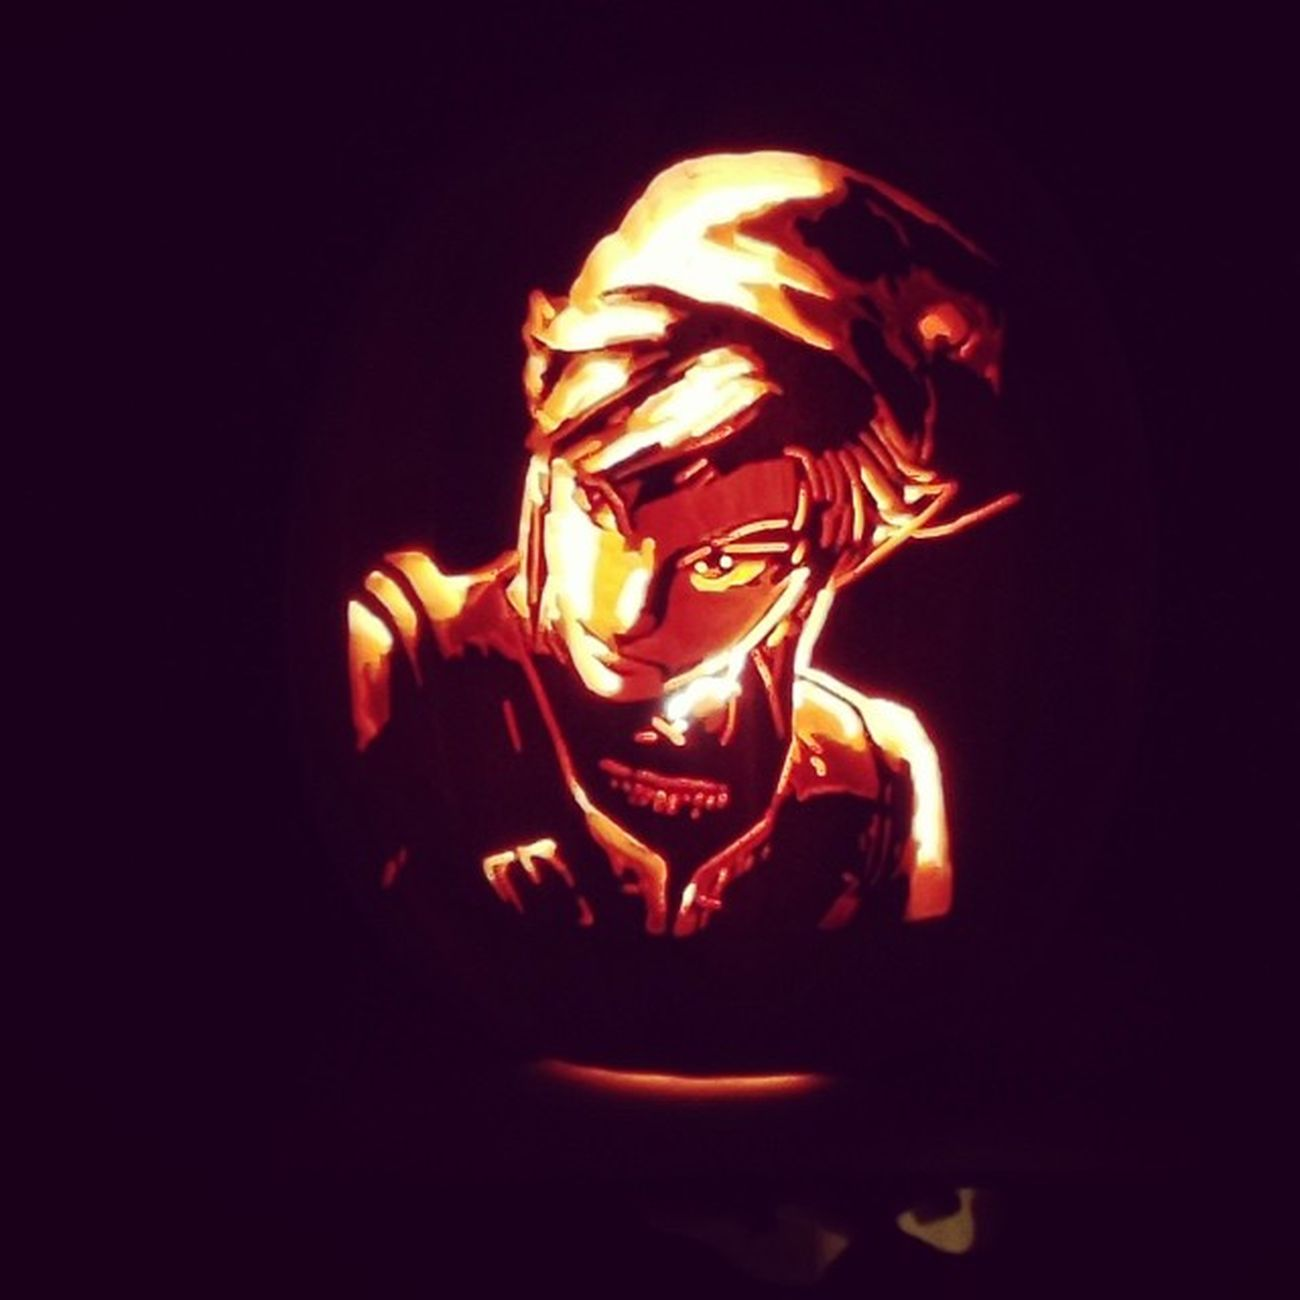 Link jack o lantern Perfect Zeldanation Zelda Loz therise